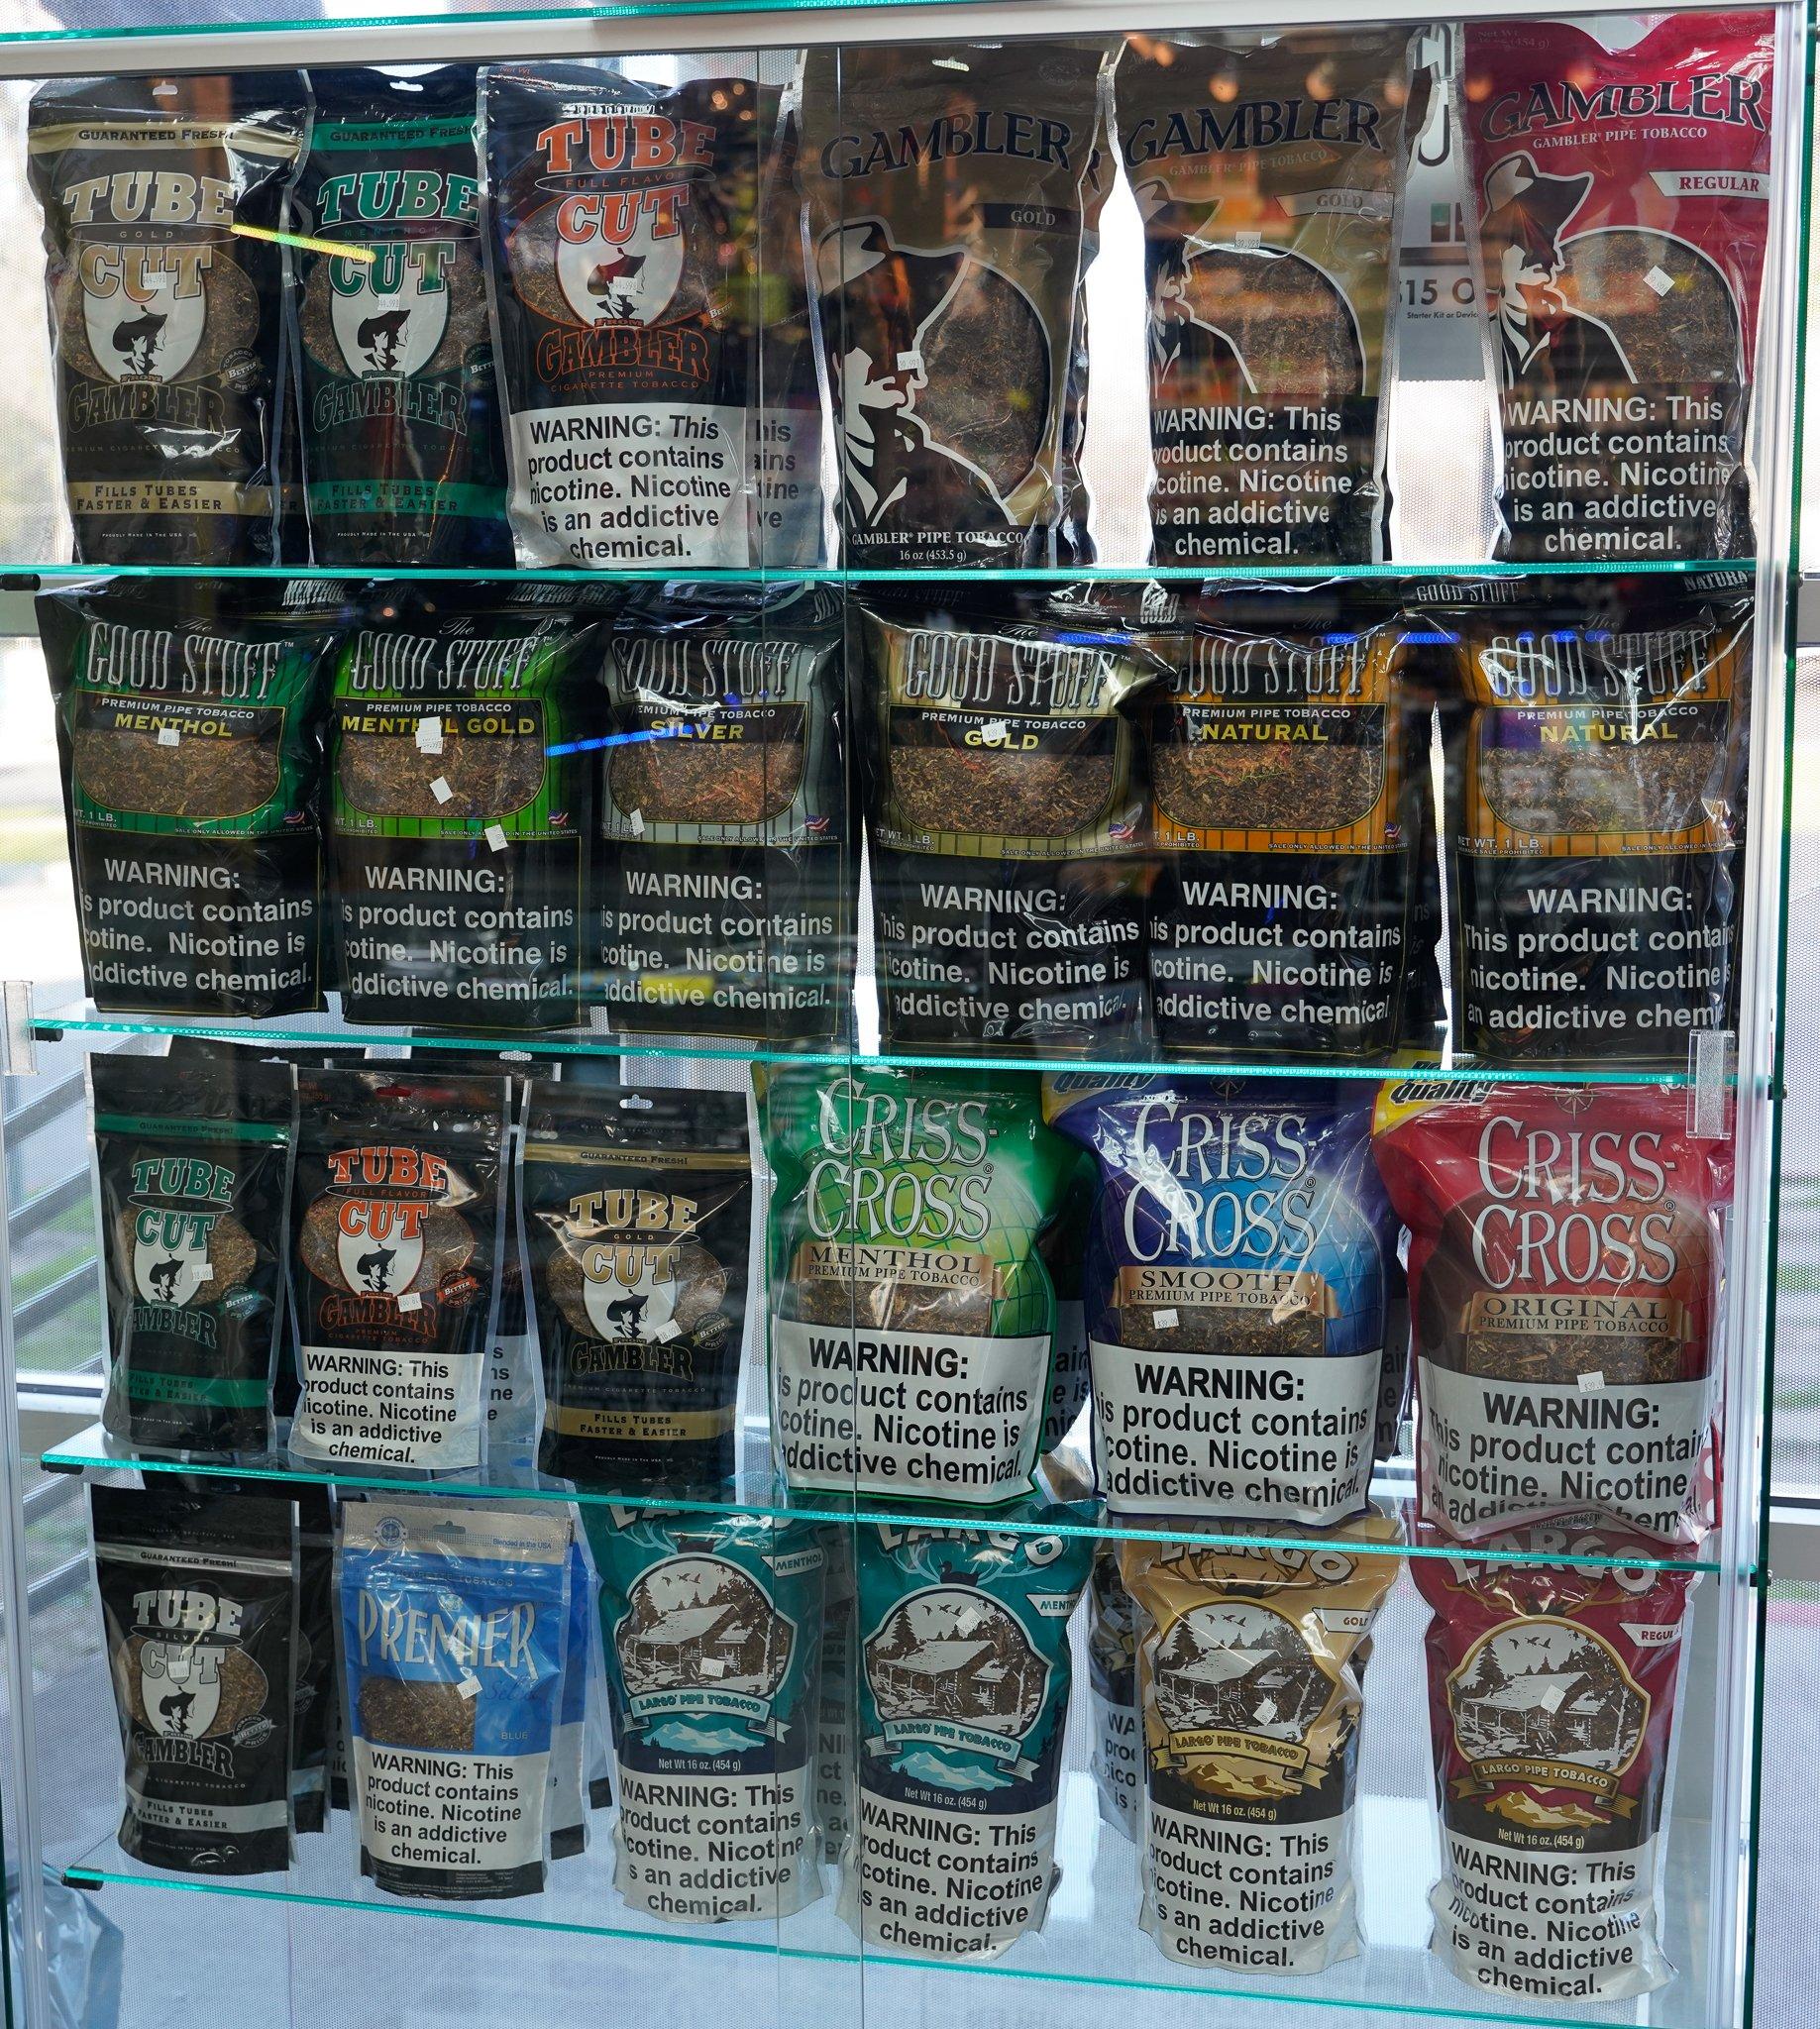 BEST SMOKE SHOP TEXAS ATX VAPE HOOKAH PIPE DETOX CBD SMOKE CIGERRETES SHISHA FLAVOR CHARCOAL JUUL PUFF CBD